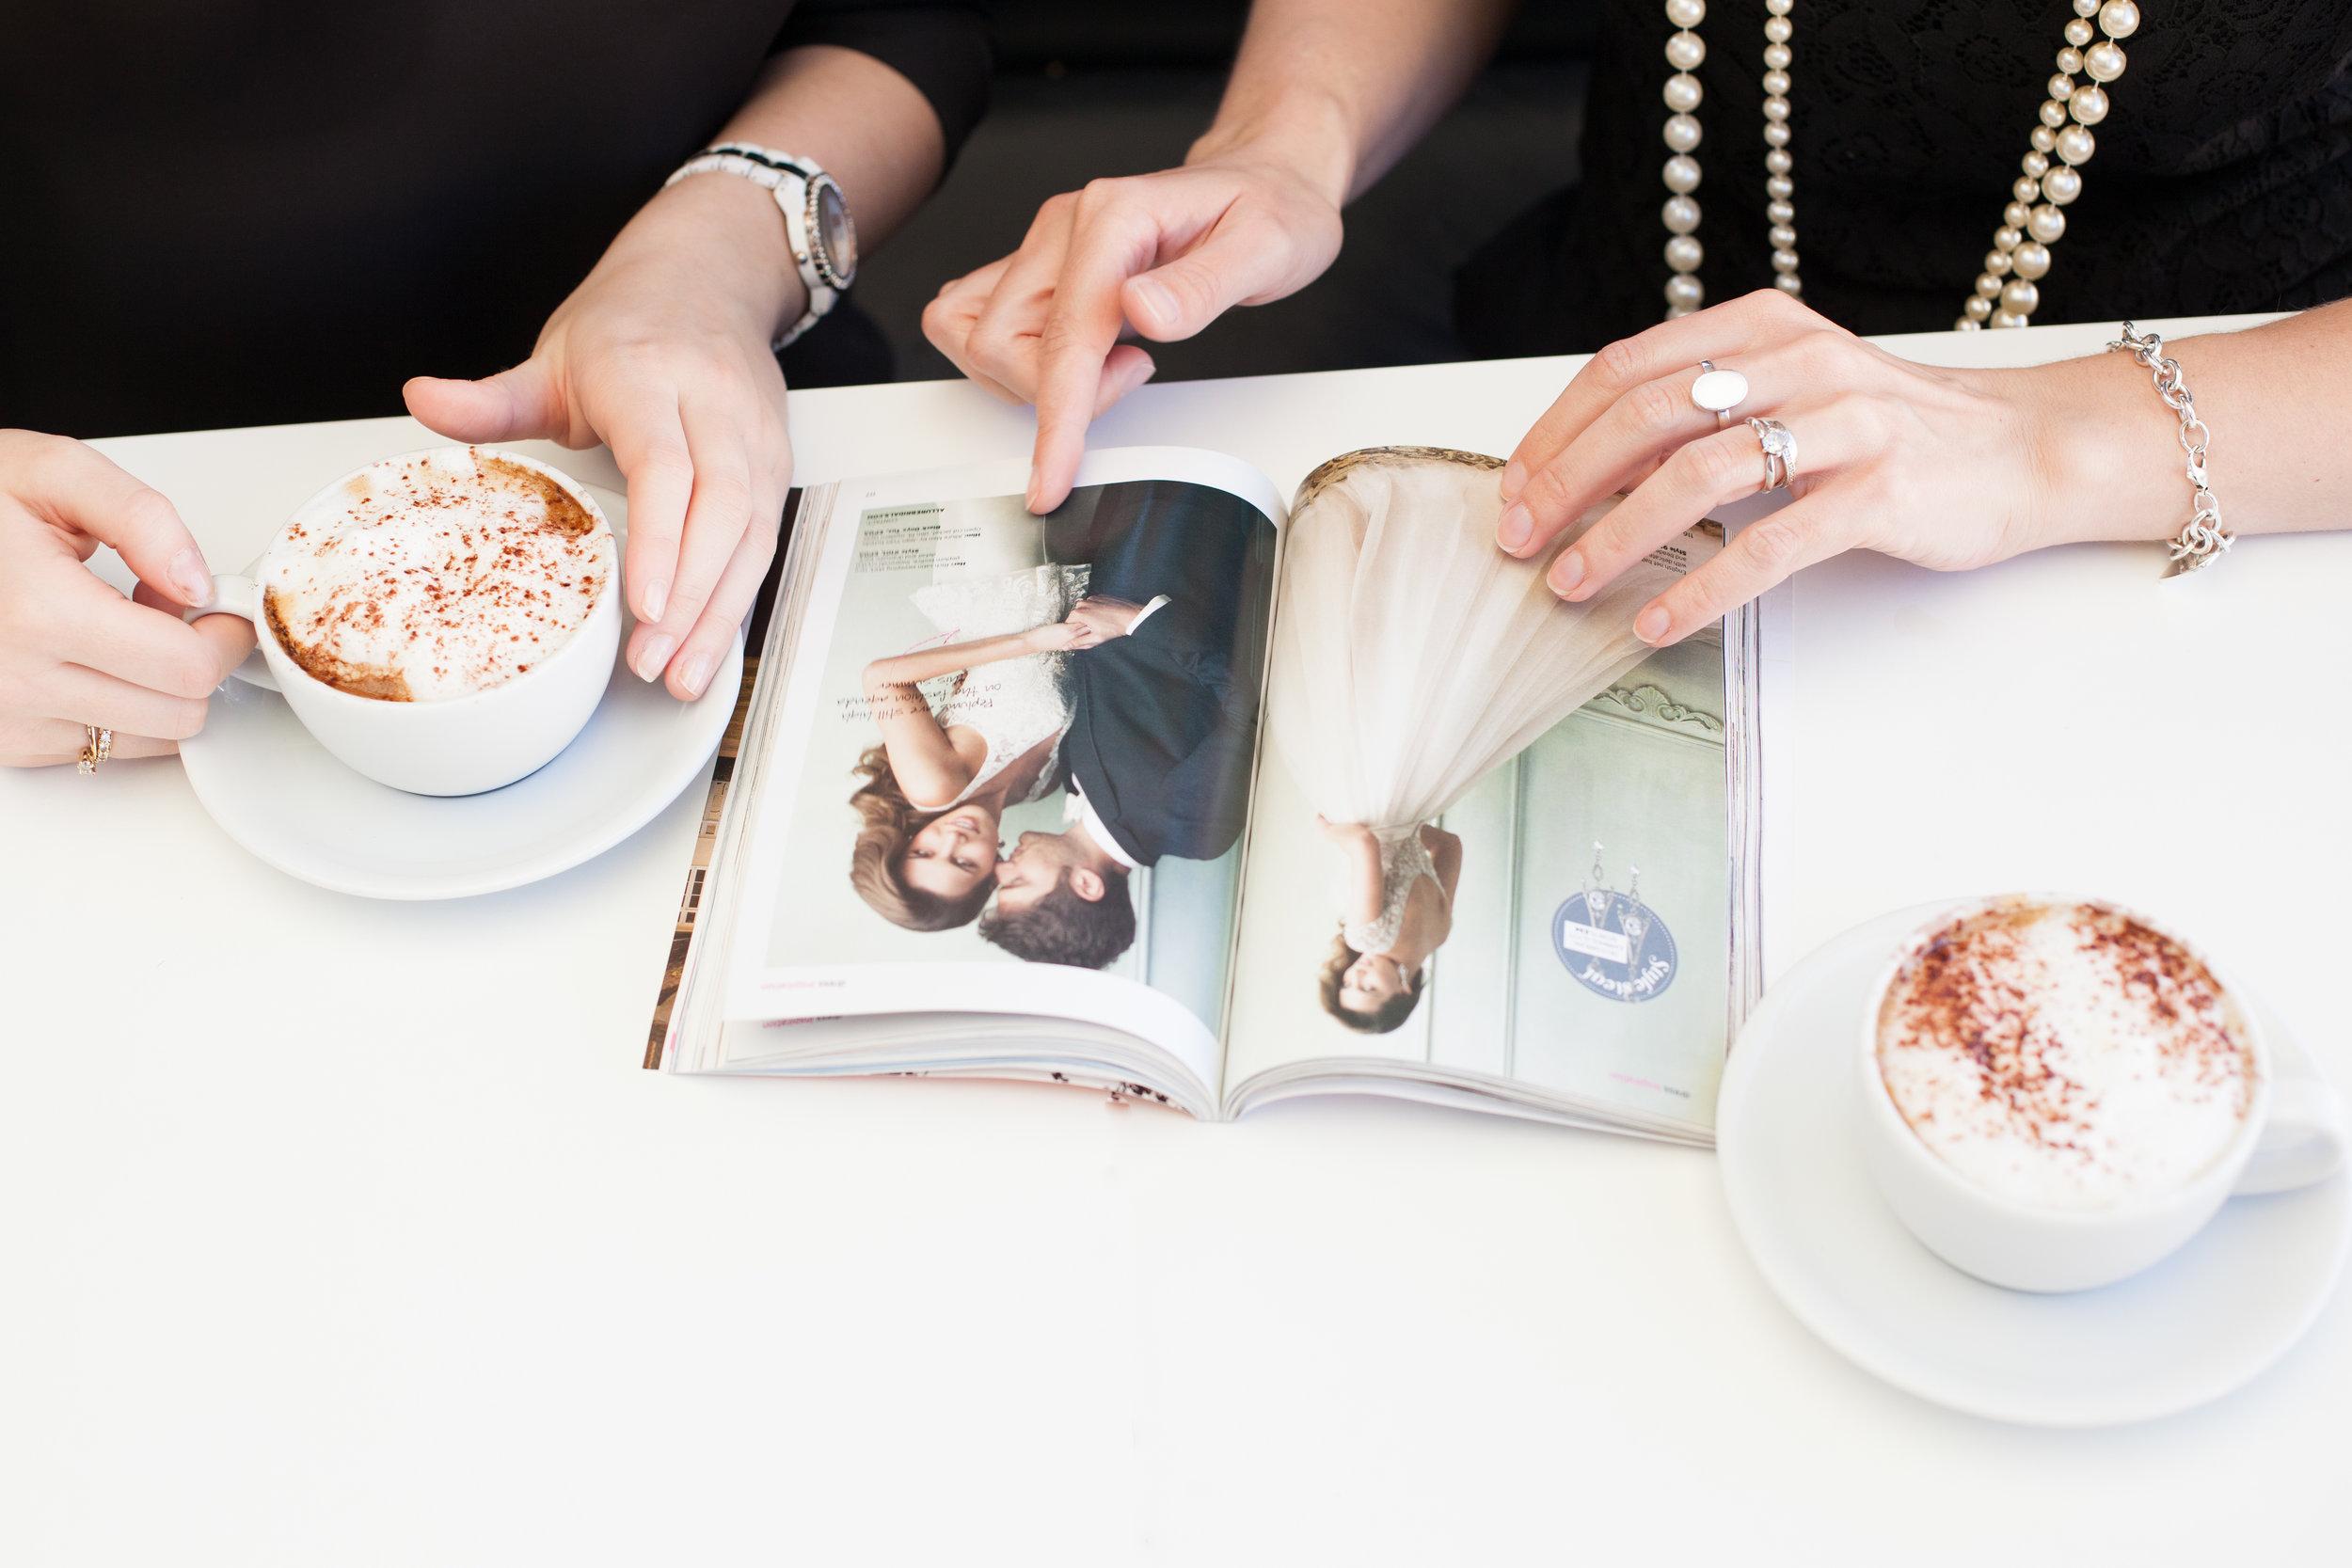 personal-branding-props-photo-shoot